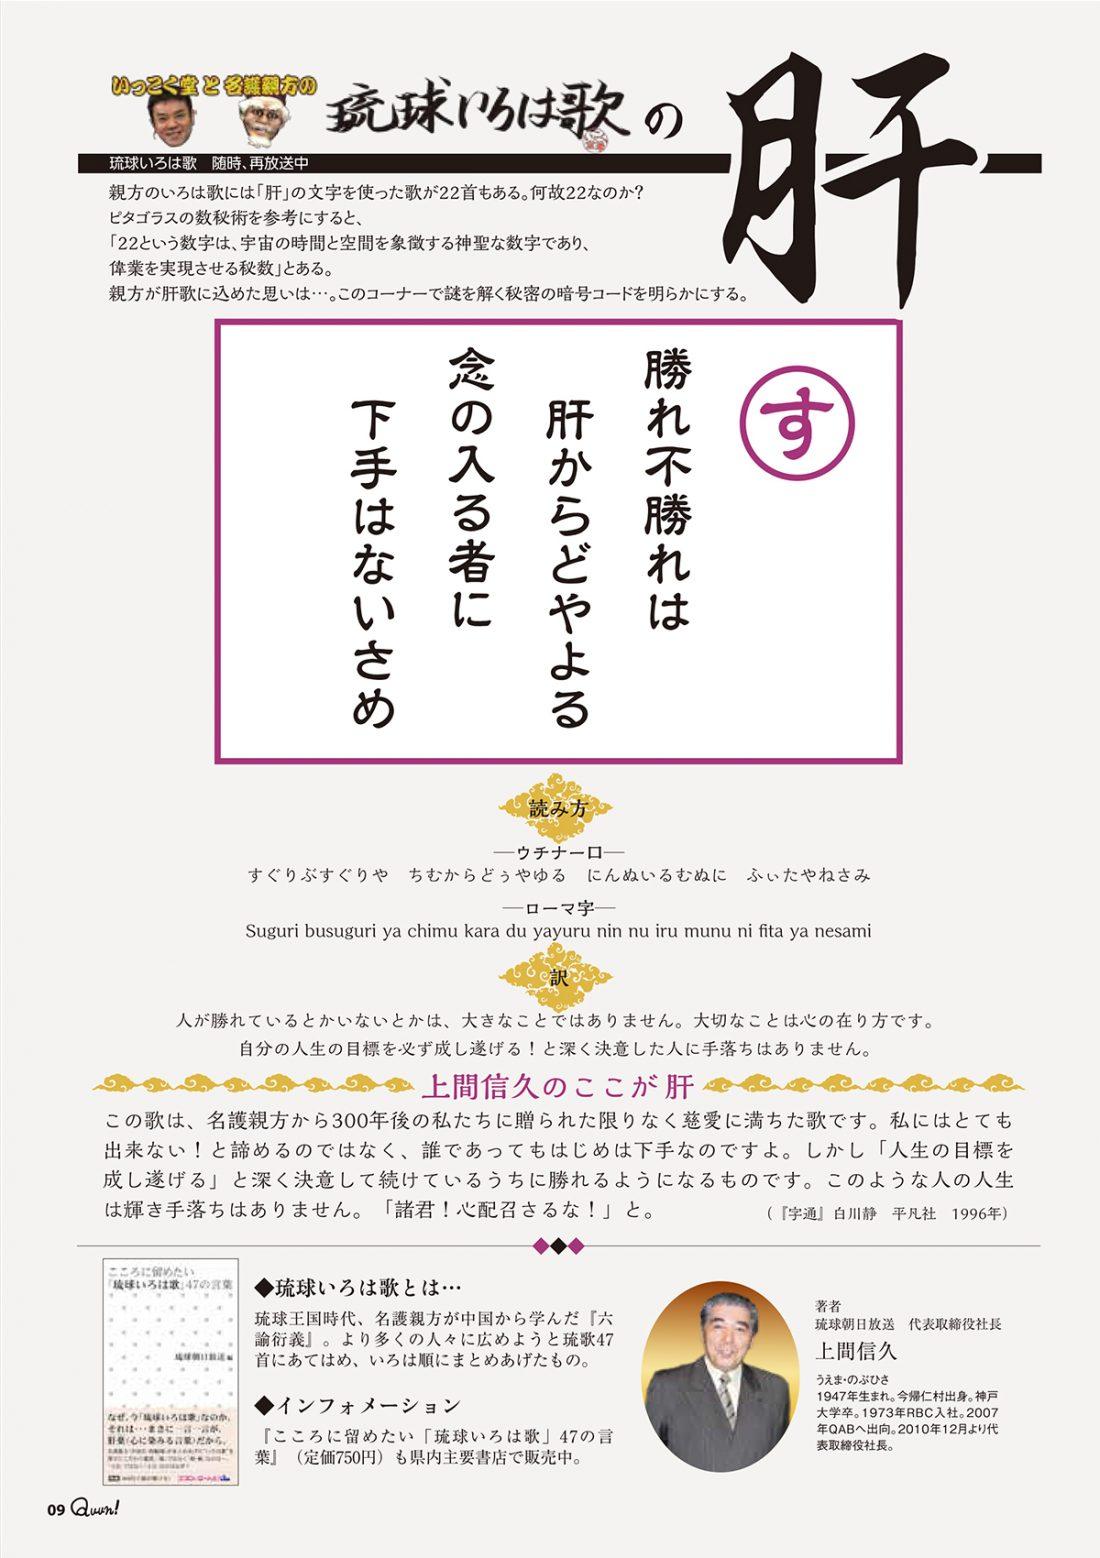 http://www.qab.co.jp/qgoro/wp-content/uploads/quun_0311-1100x1558.jpg